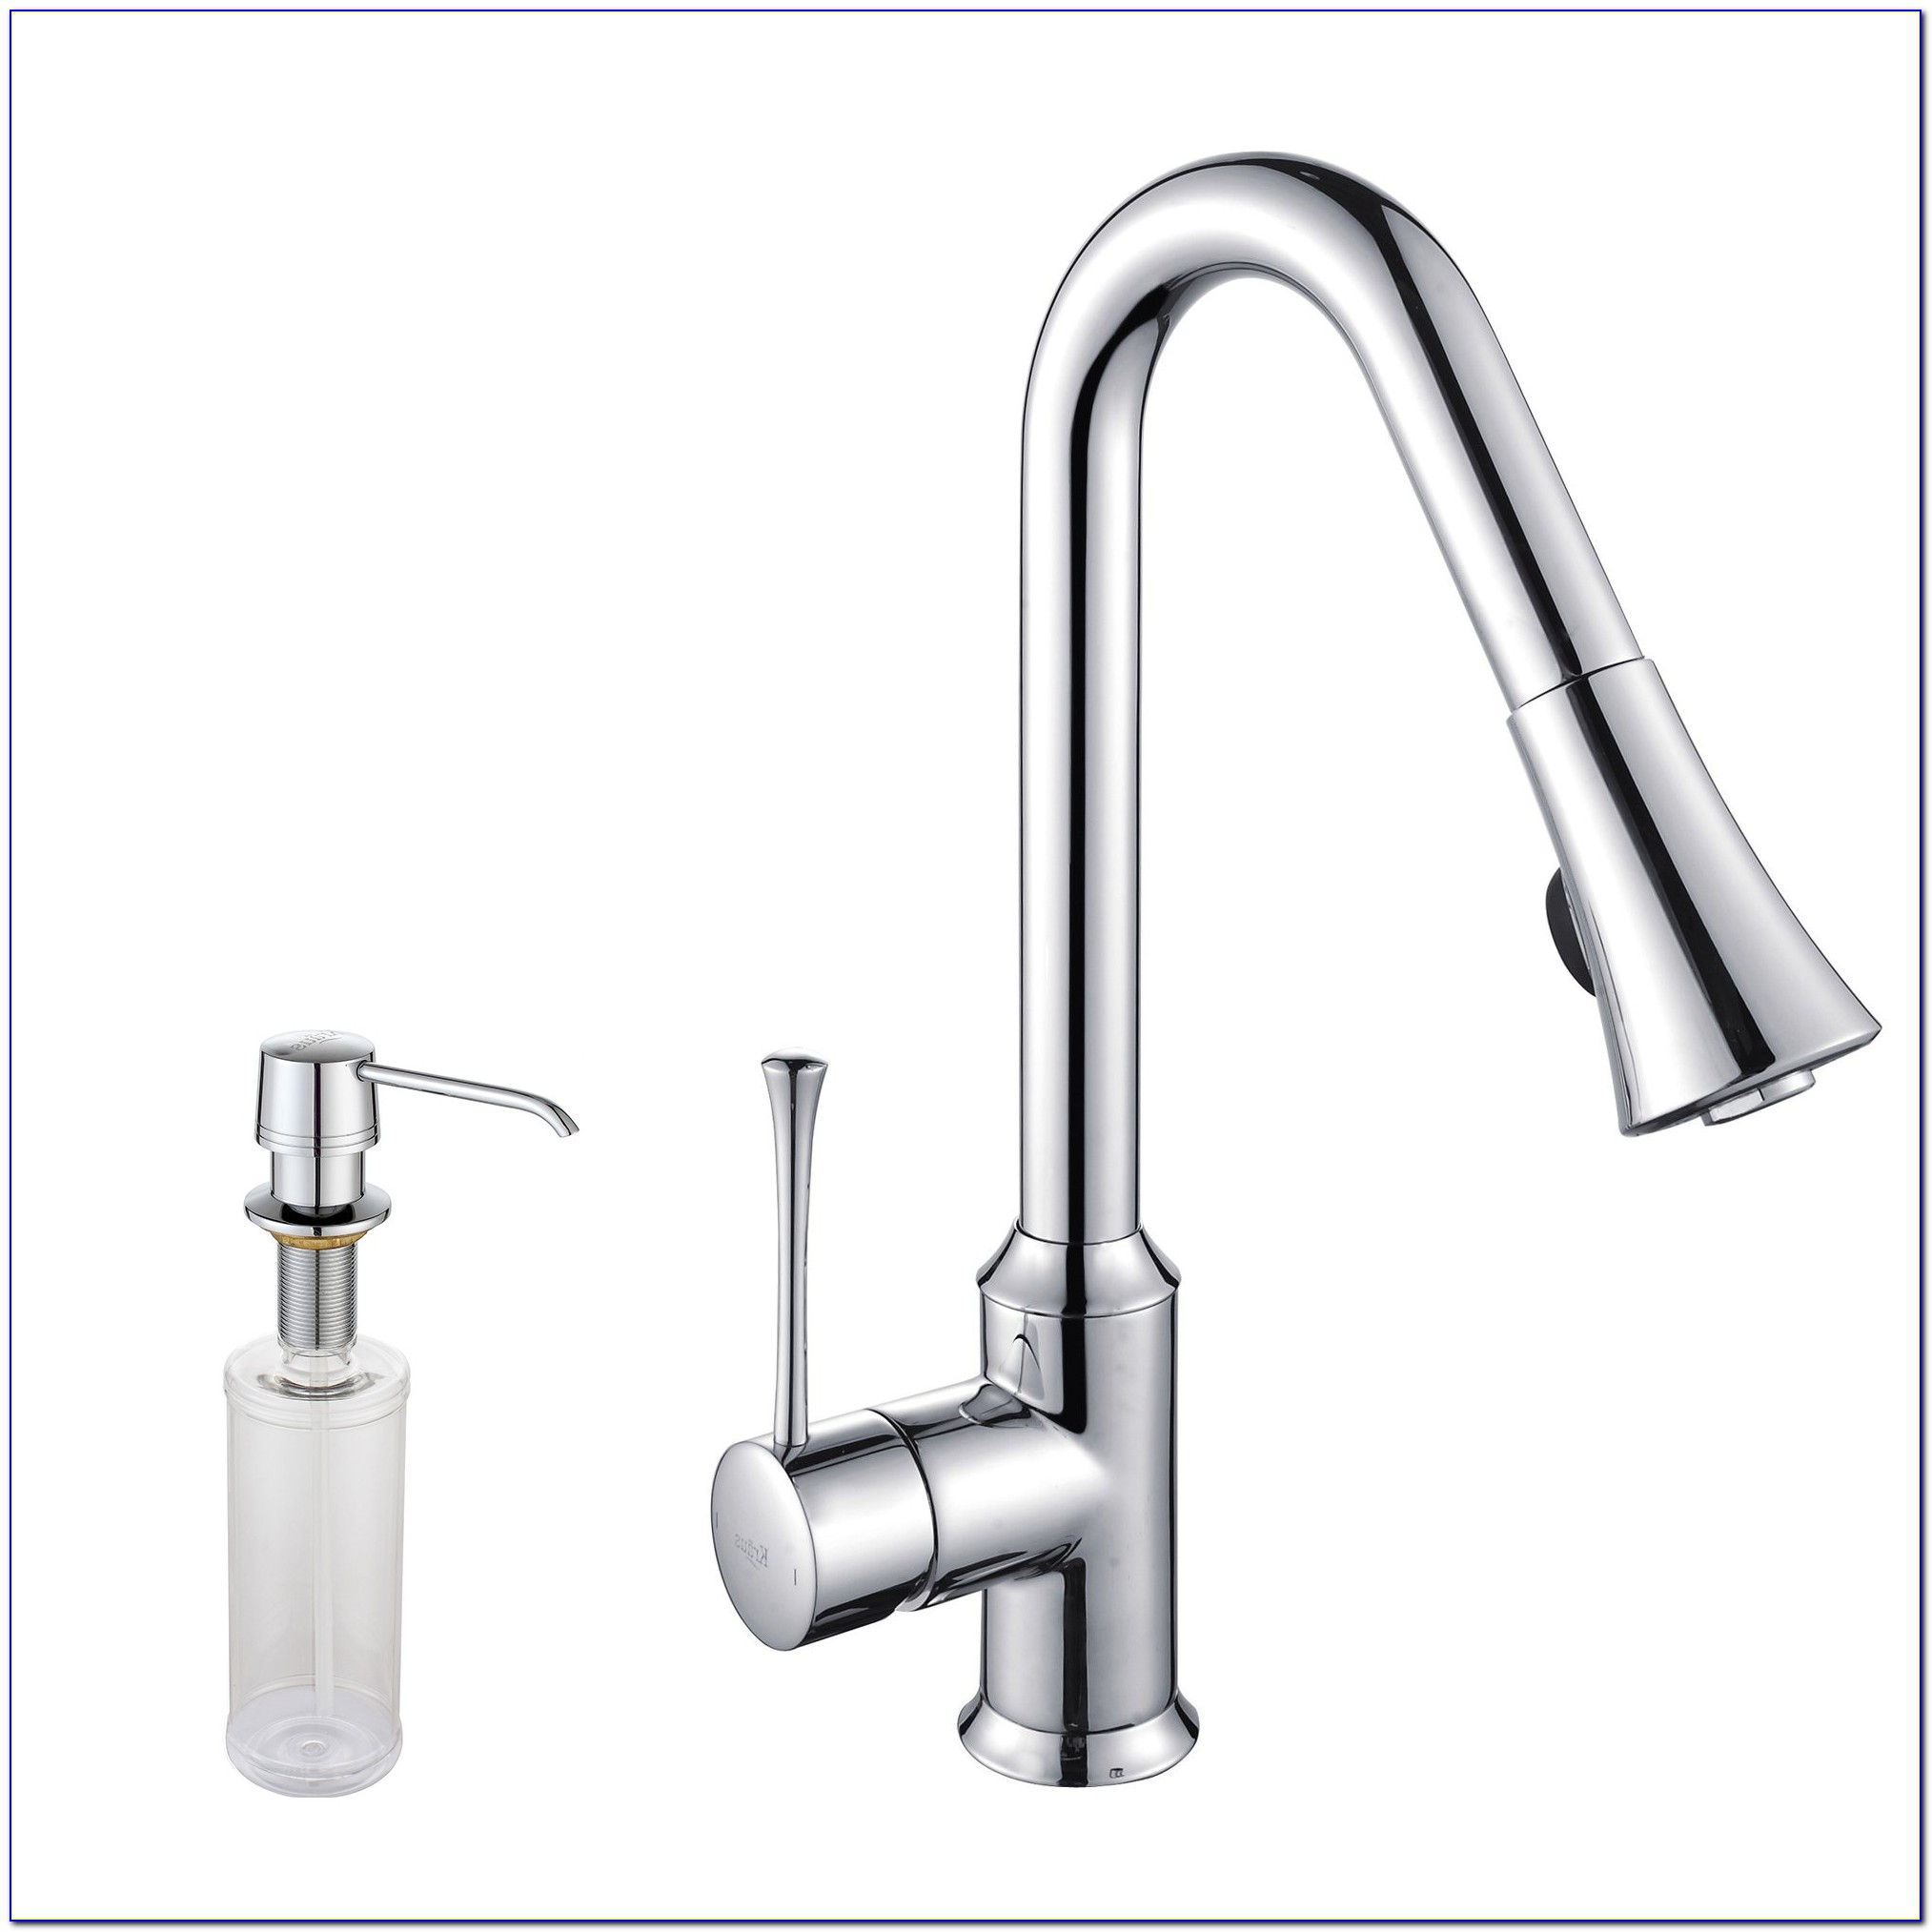 Moen Kitchen Faucet With Soap Dispenser